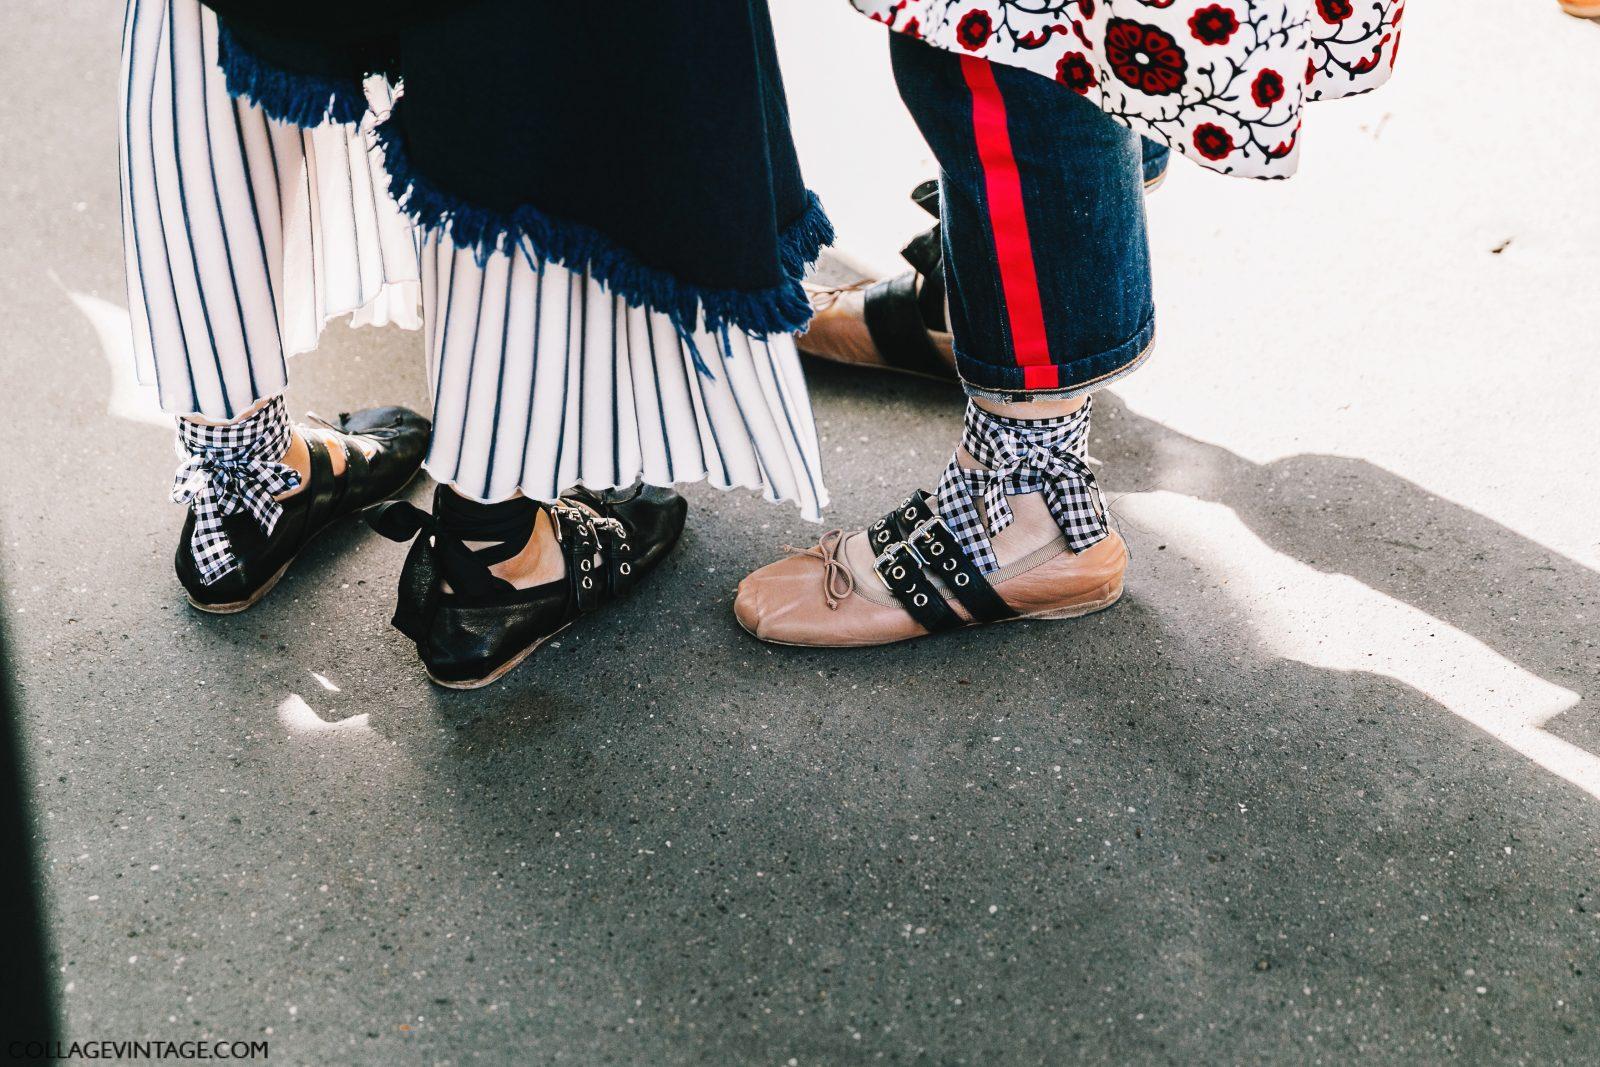 pfw-paris_fashion_week_ss17-street_style-outfit-collage_vintage-louis_vuitton-miu_miu